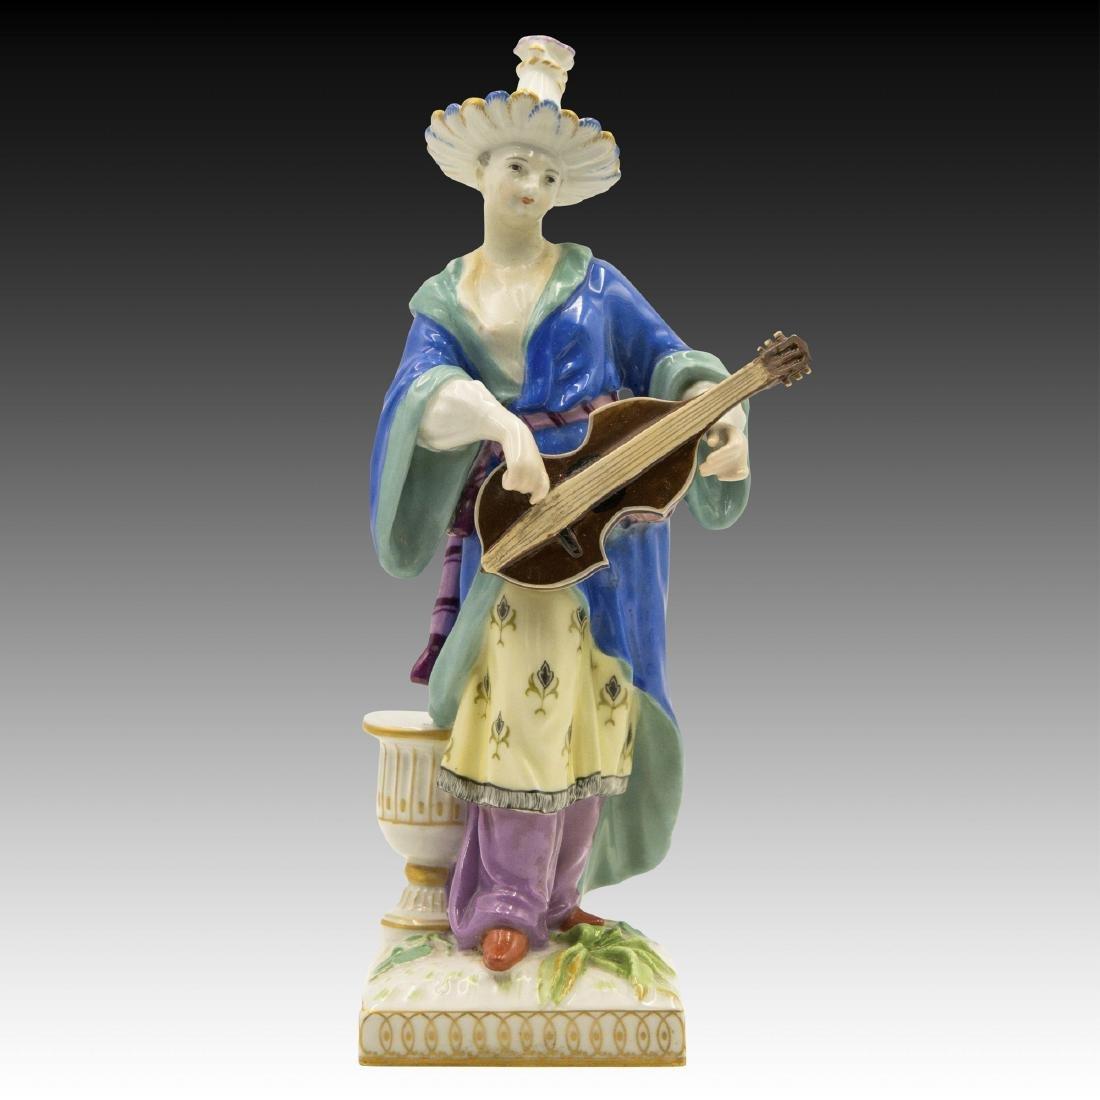 KPM Porcelain Malabar Female Musician Figurine